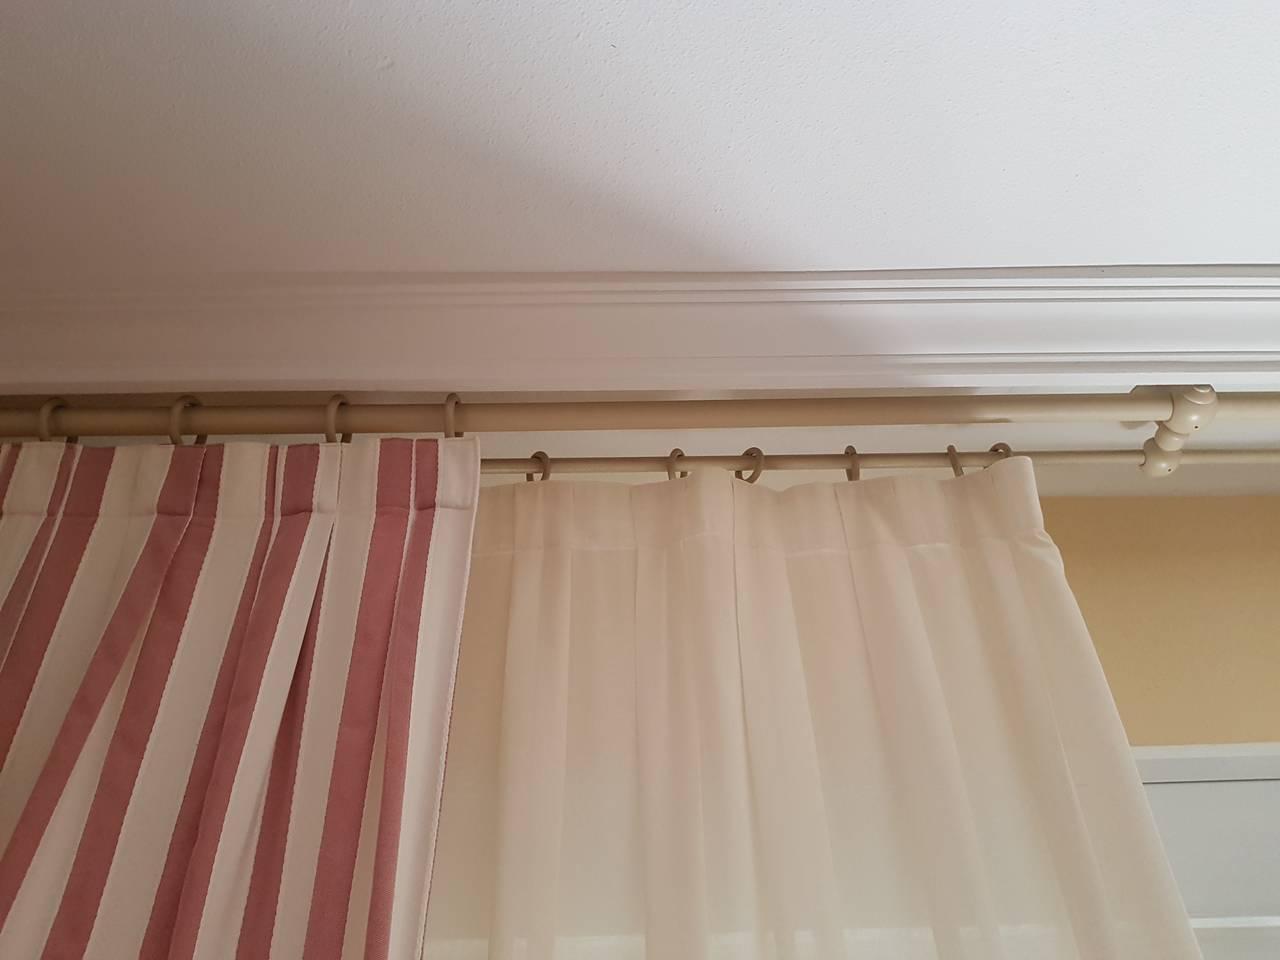 Barras de madera para cortinas de salón.  - Foto 1